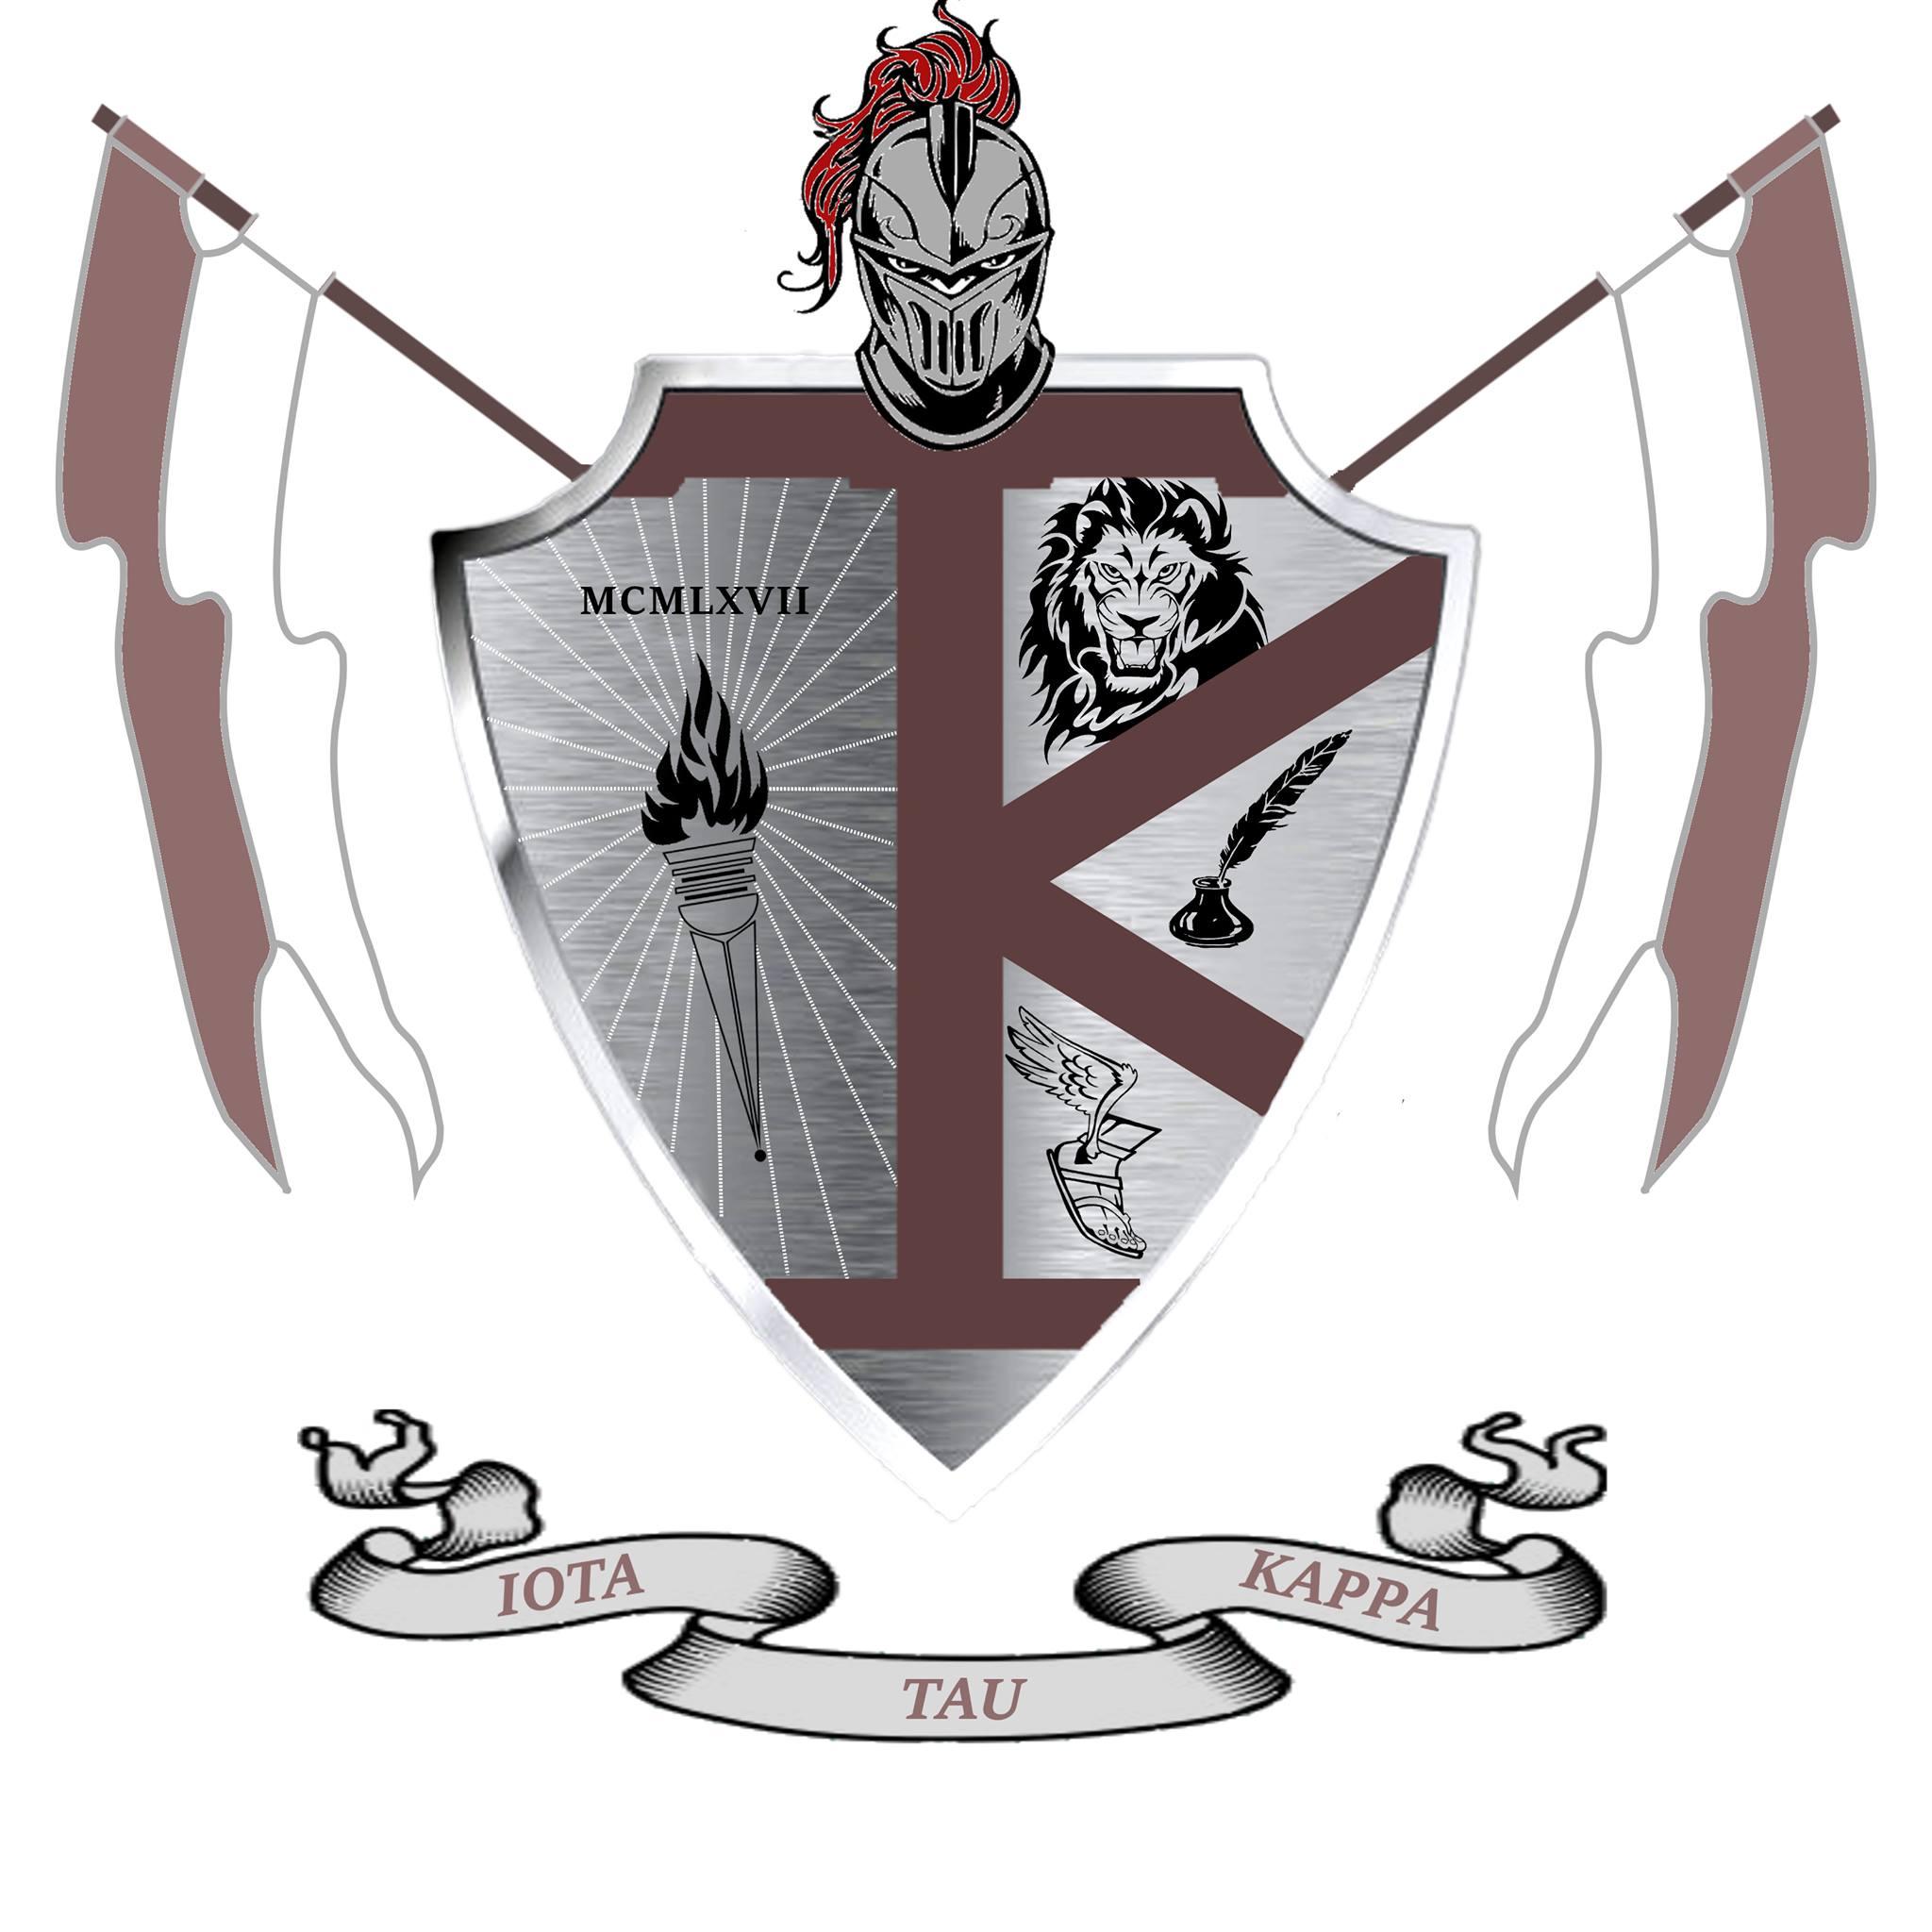 Filecrest Of The Iota Tau Kappa Fraternityg Wikimedia Commons